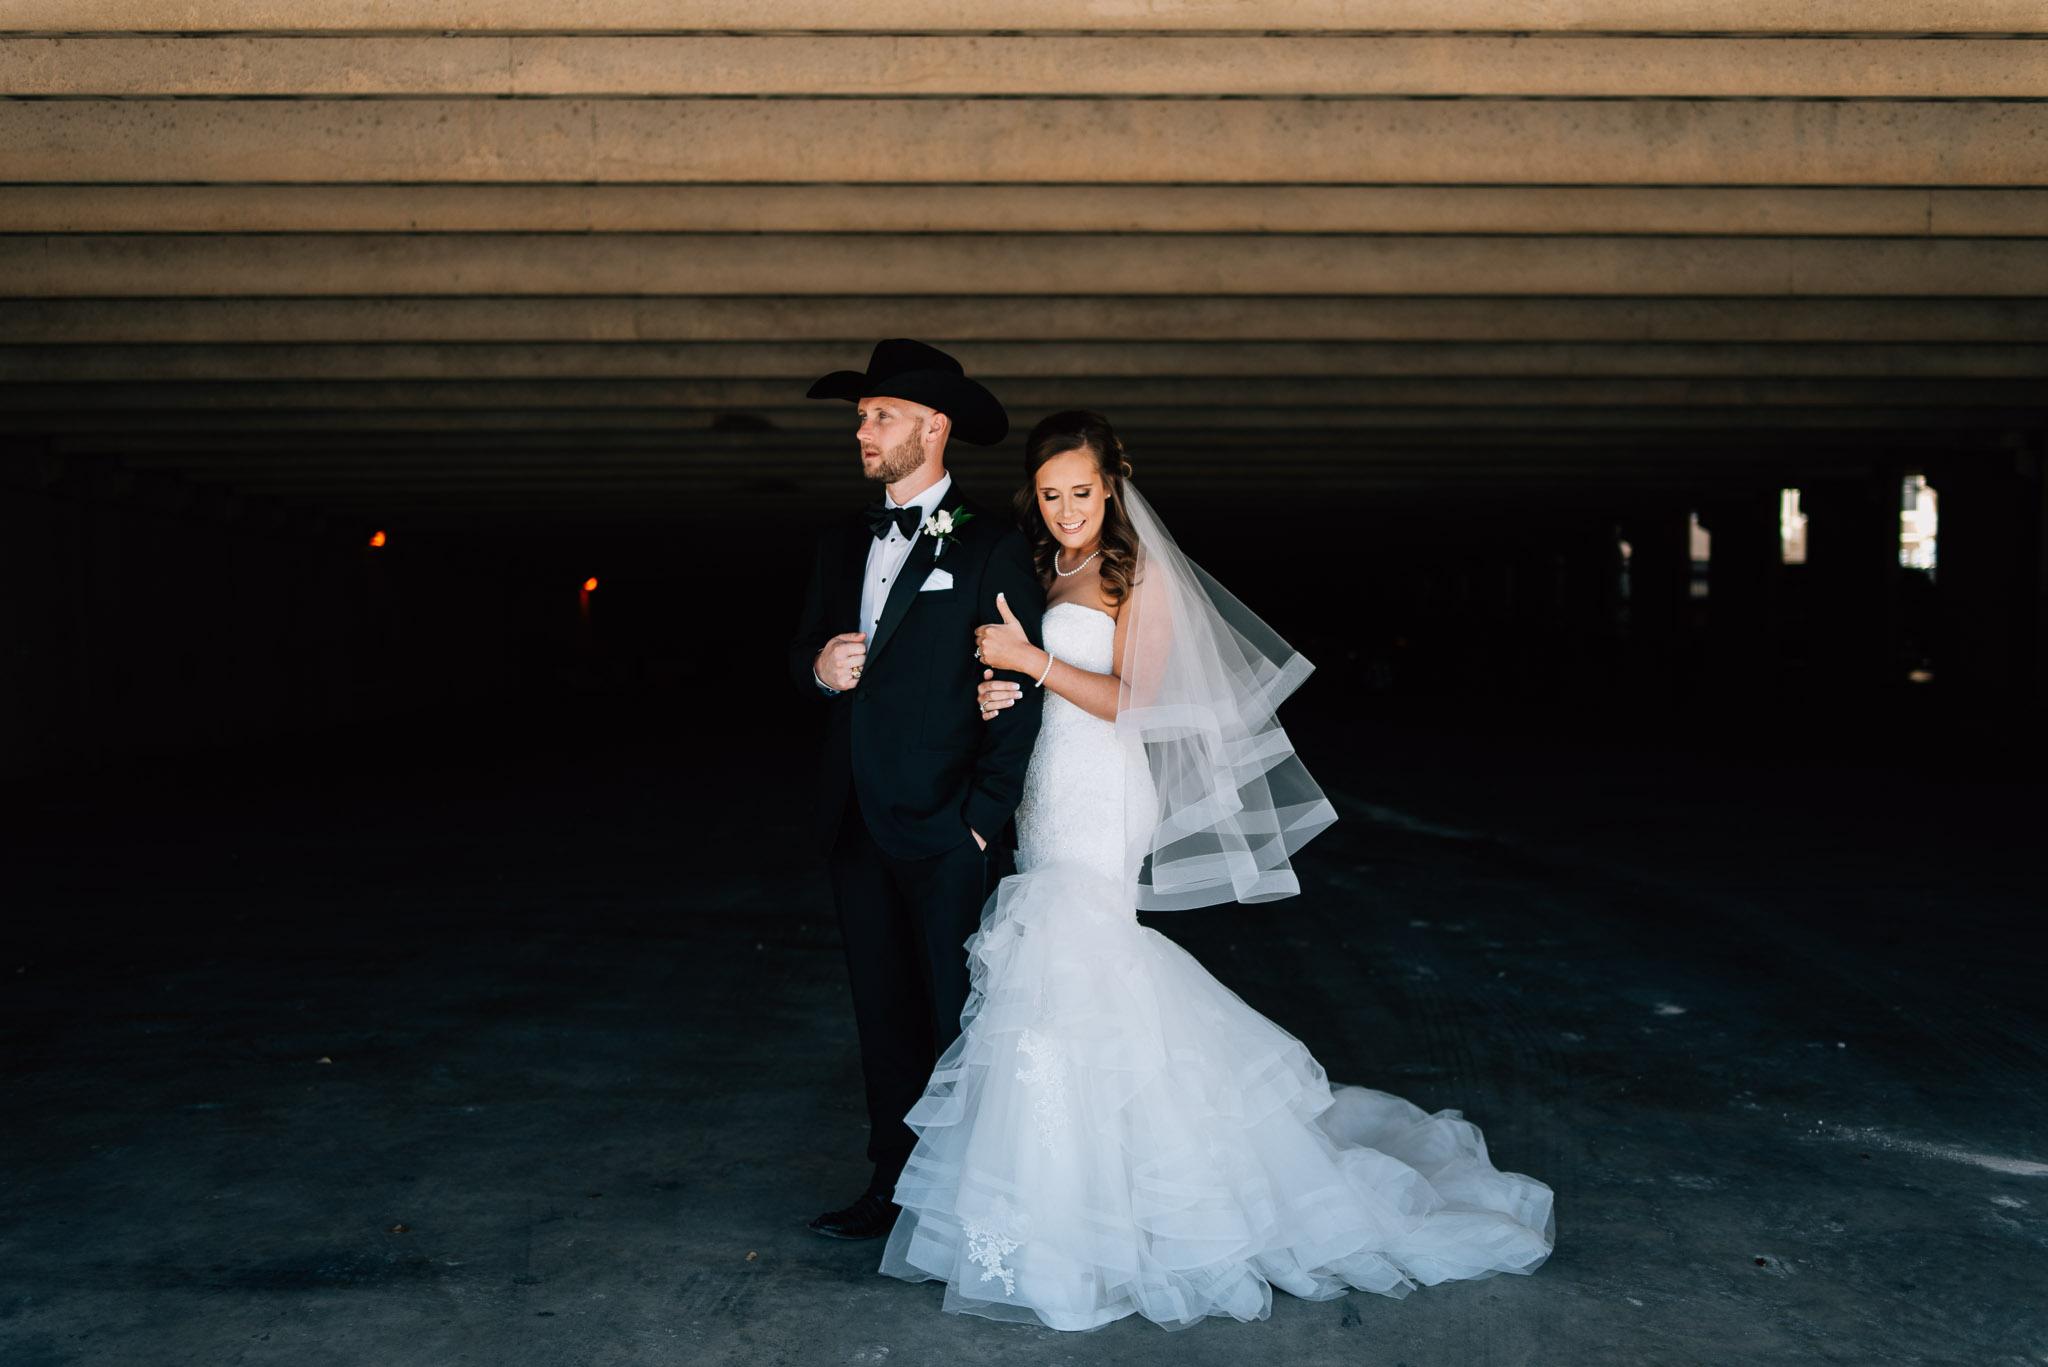 Cactus-Hotel-Wedding-San-Angelo-0009.jpg